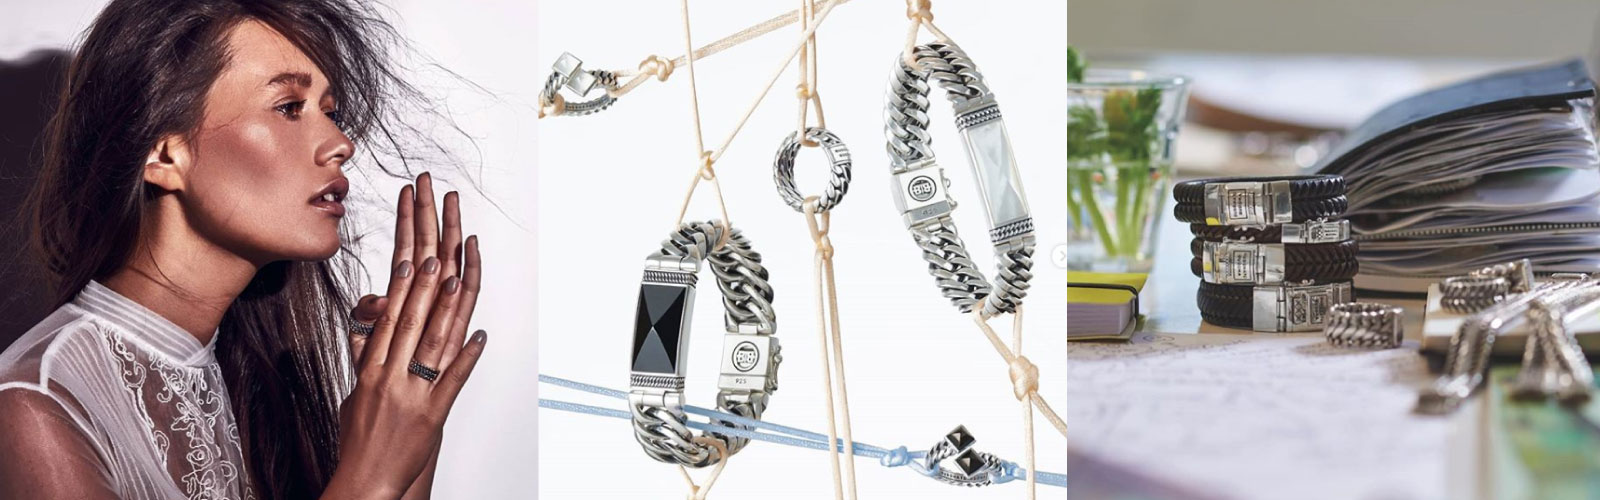 BUDDHA-TO-BUDDHA-stoere-handgemaakte-sieraden-zilver-shoppen-bij-Wolters-Juweliers-Coevorden-Emmen